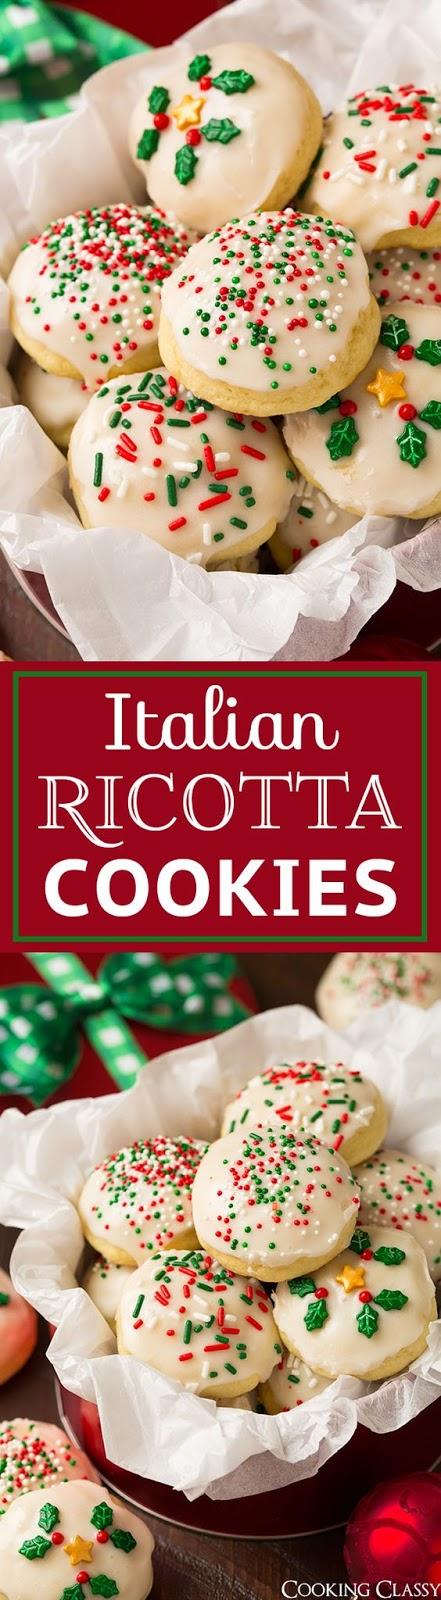 https://www.cookingclassy.com/italian-ricotta-cookies/